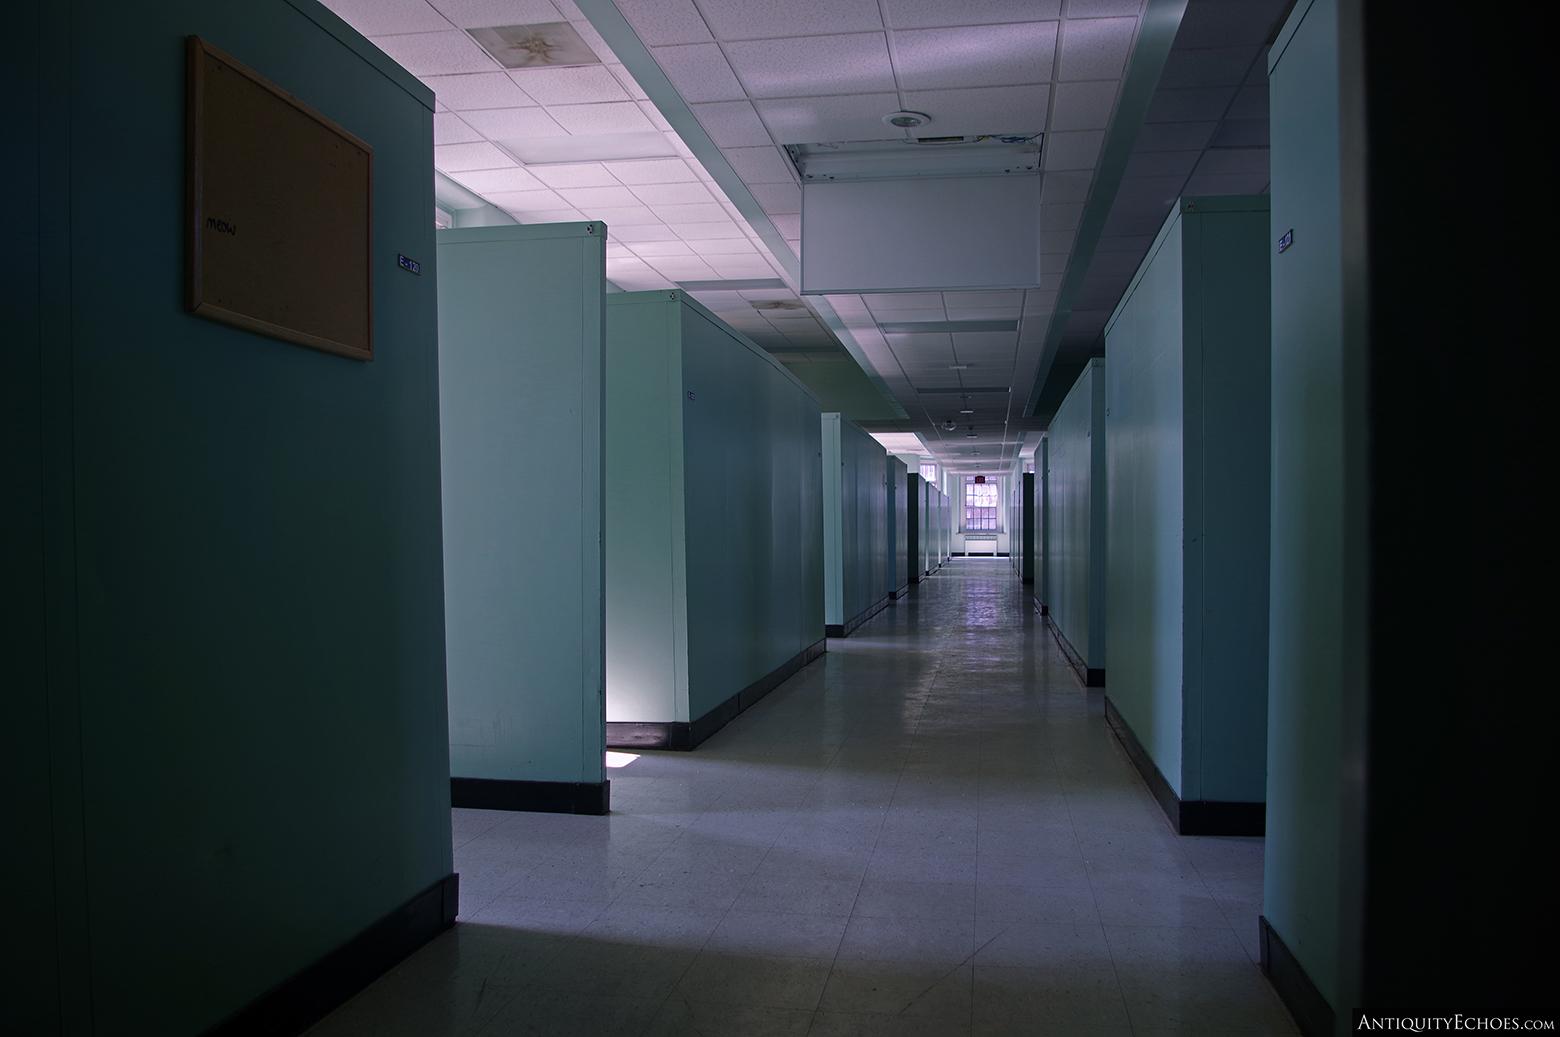 Allentown State Hospital - Patient Ward